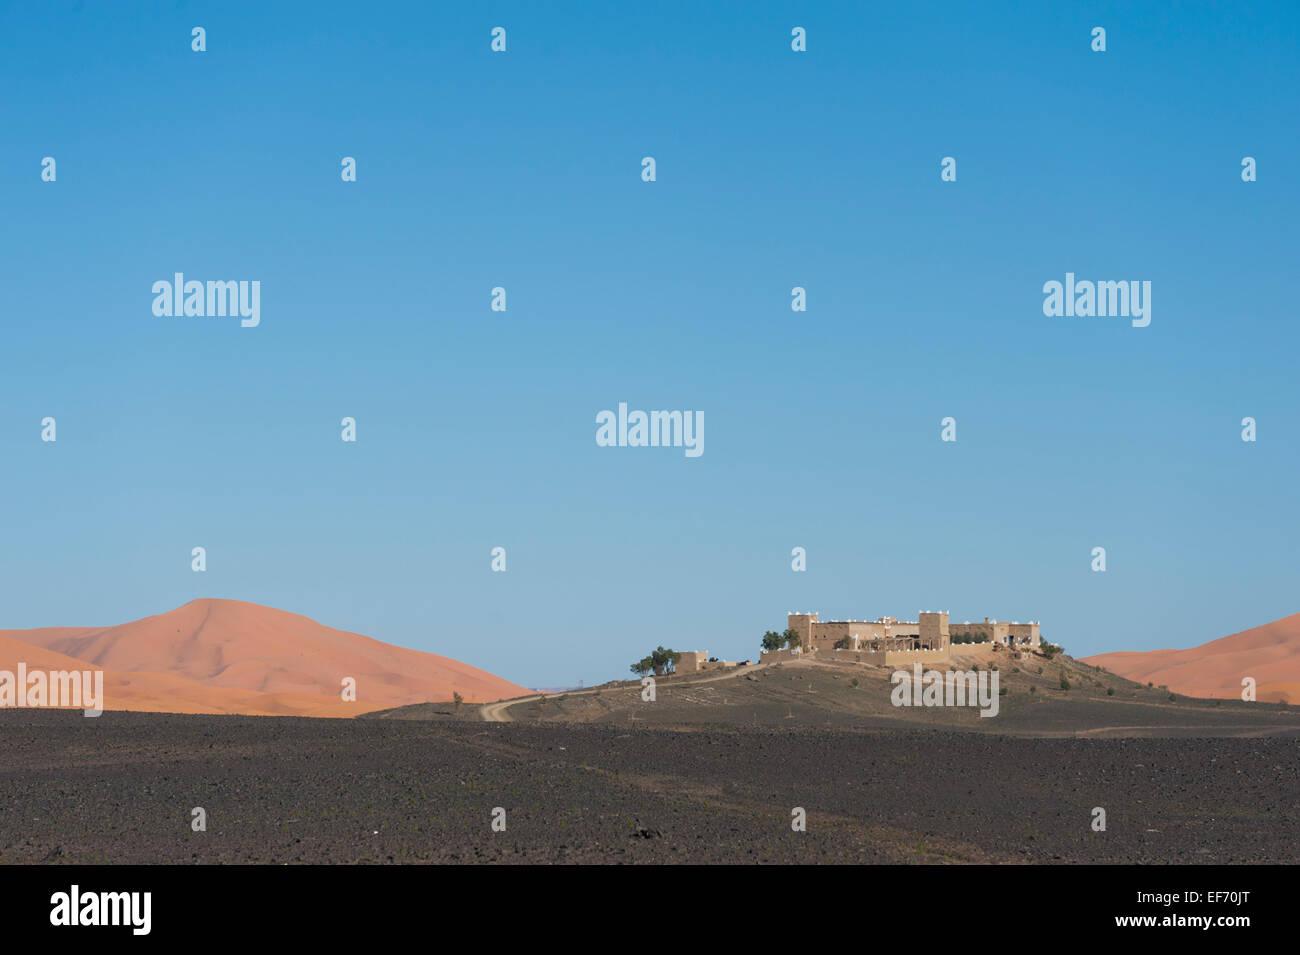 Desert Kasbah hotel, Merzouga, Morocco - Stock Image